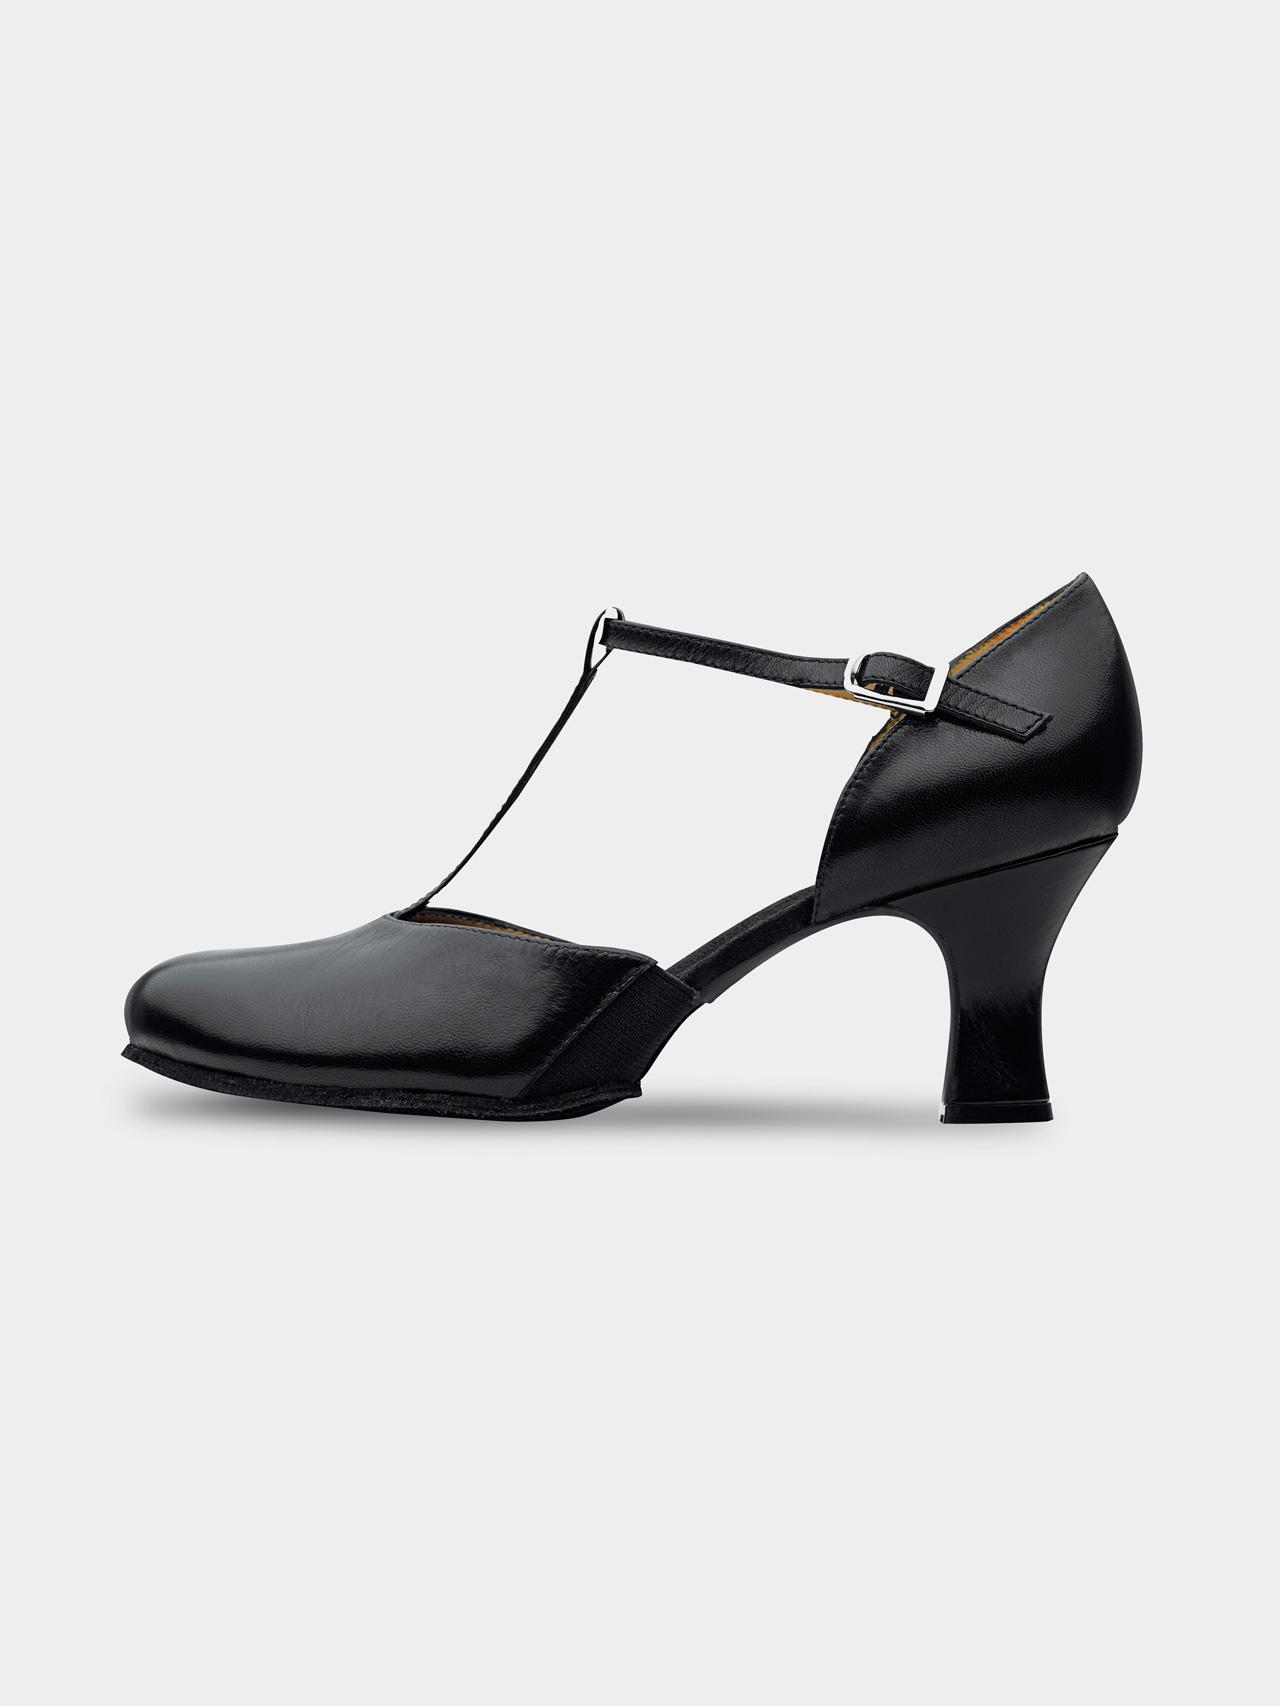 Bloch Splitflex Character Shoe Review